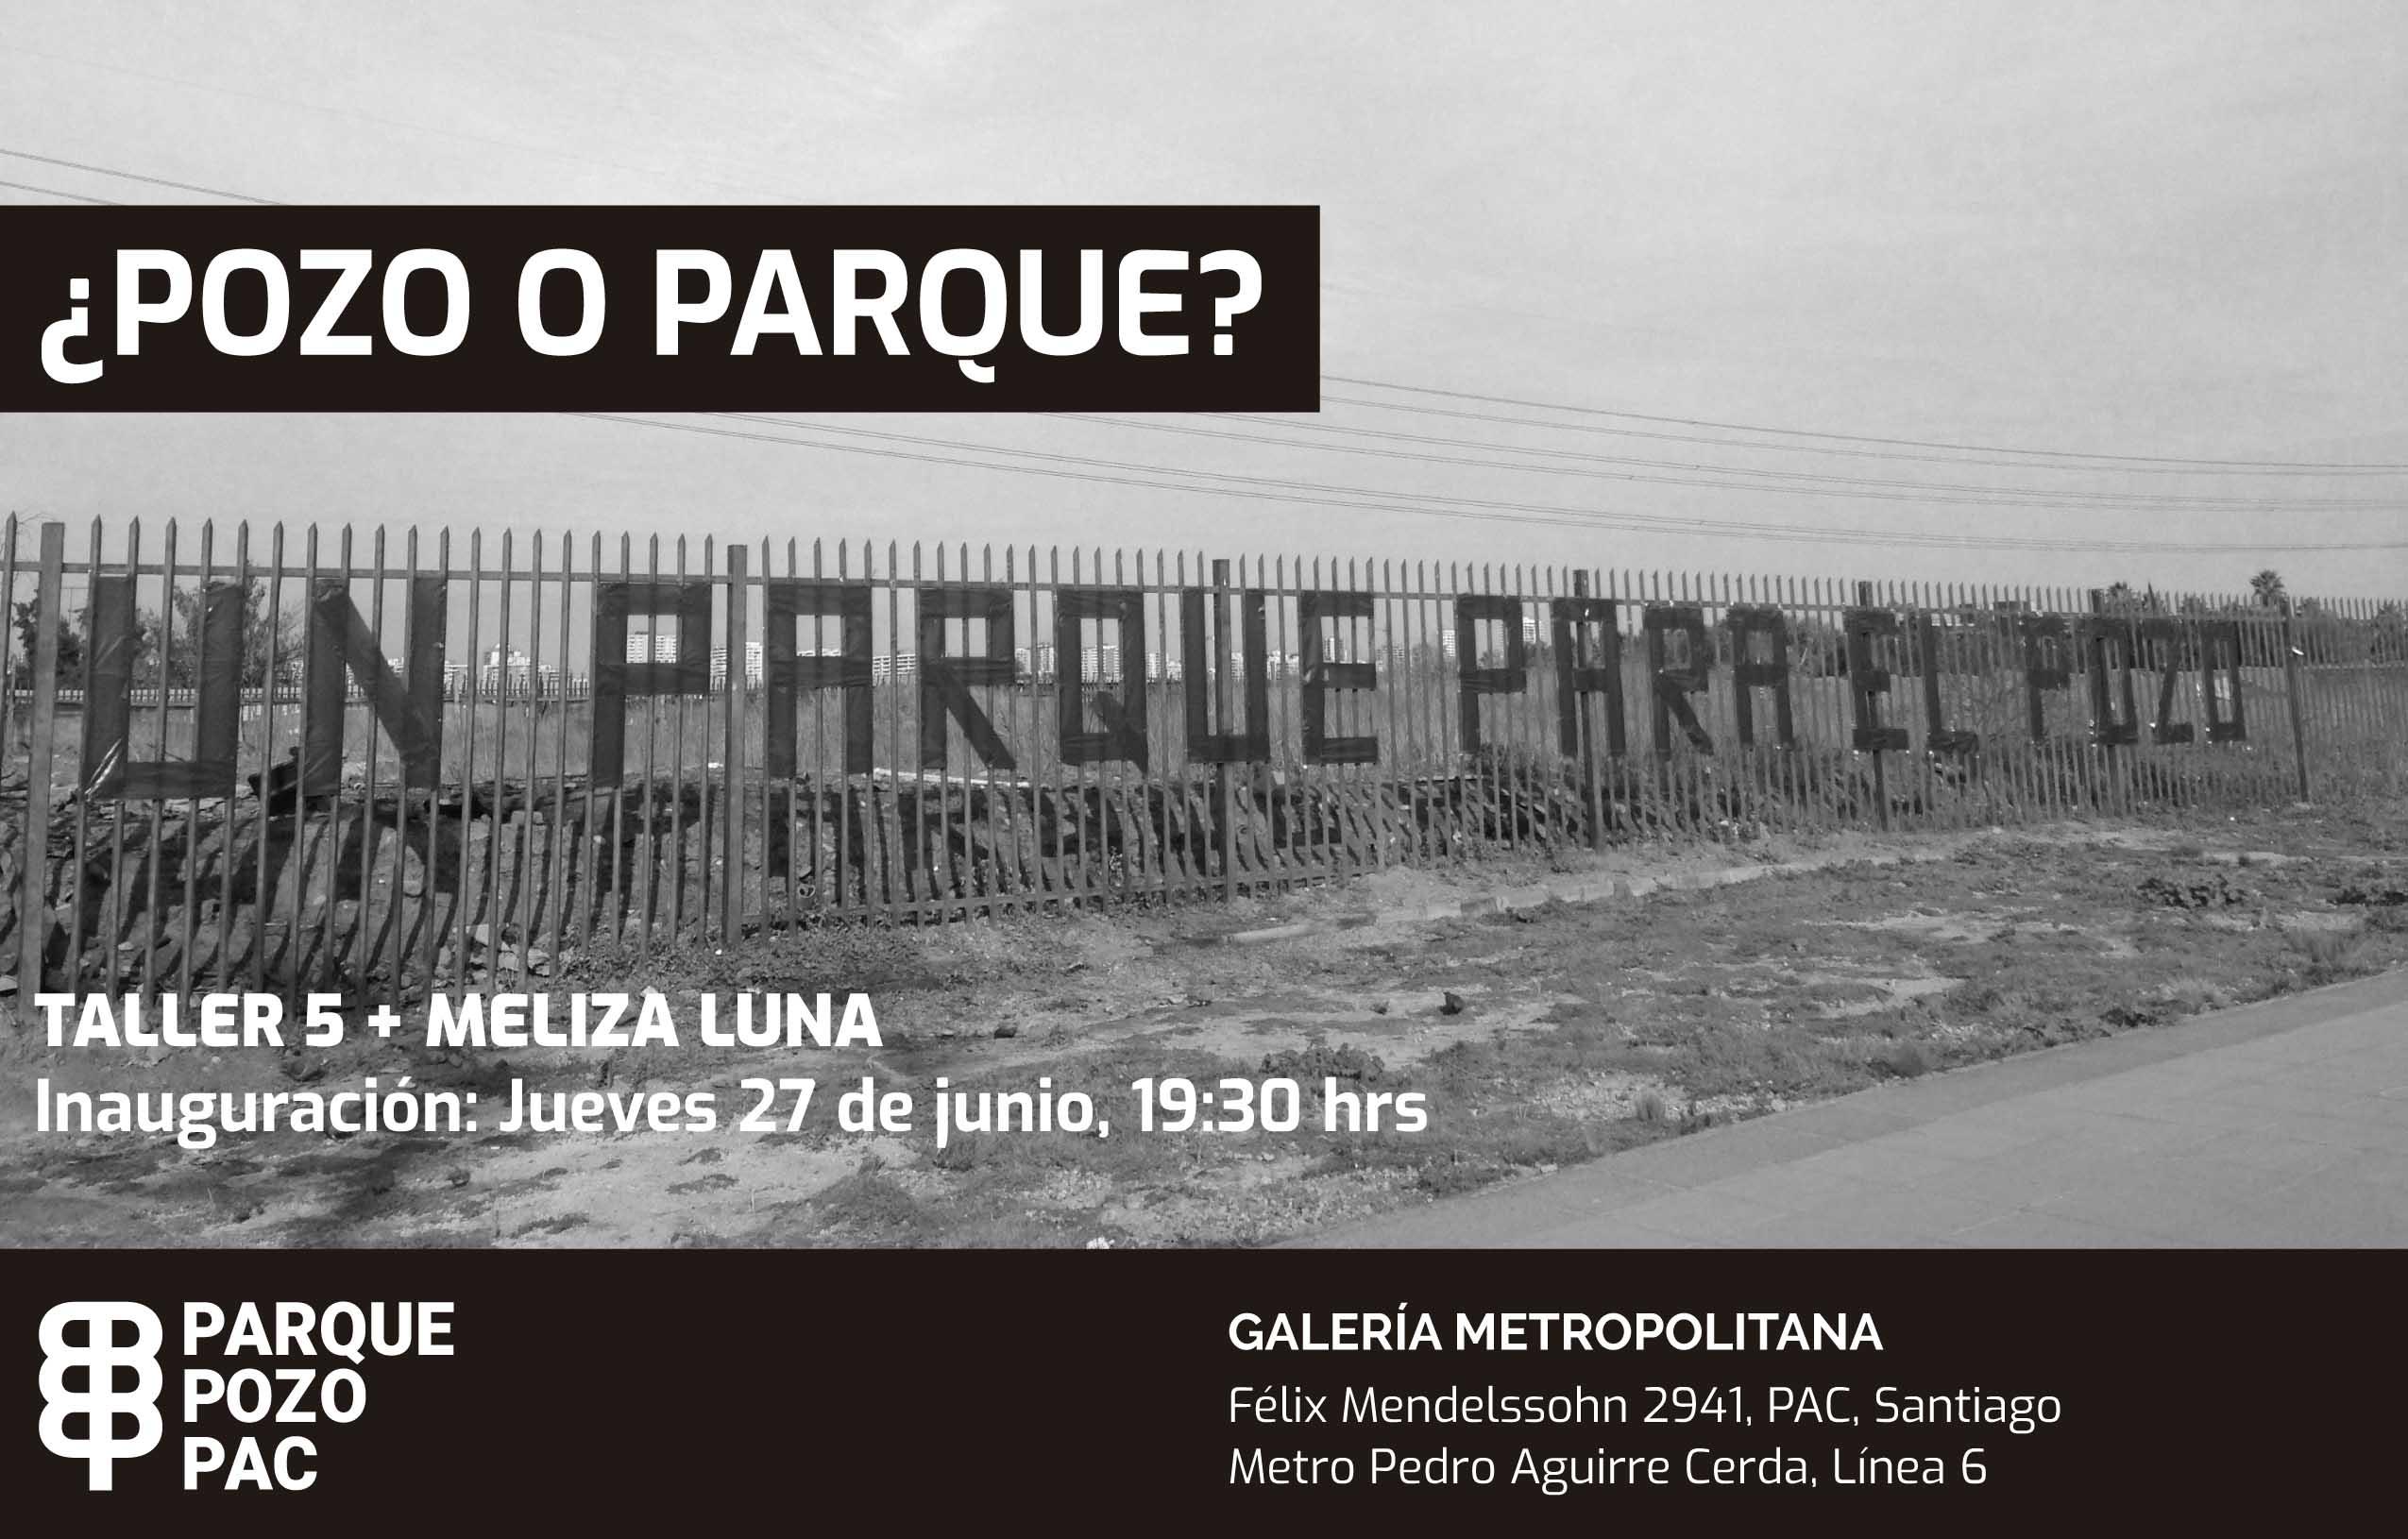 ¿POZO O PARQUE? - TALLER 5 + MELIZA LUNA